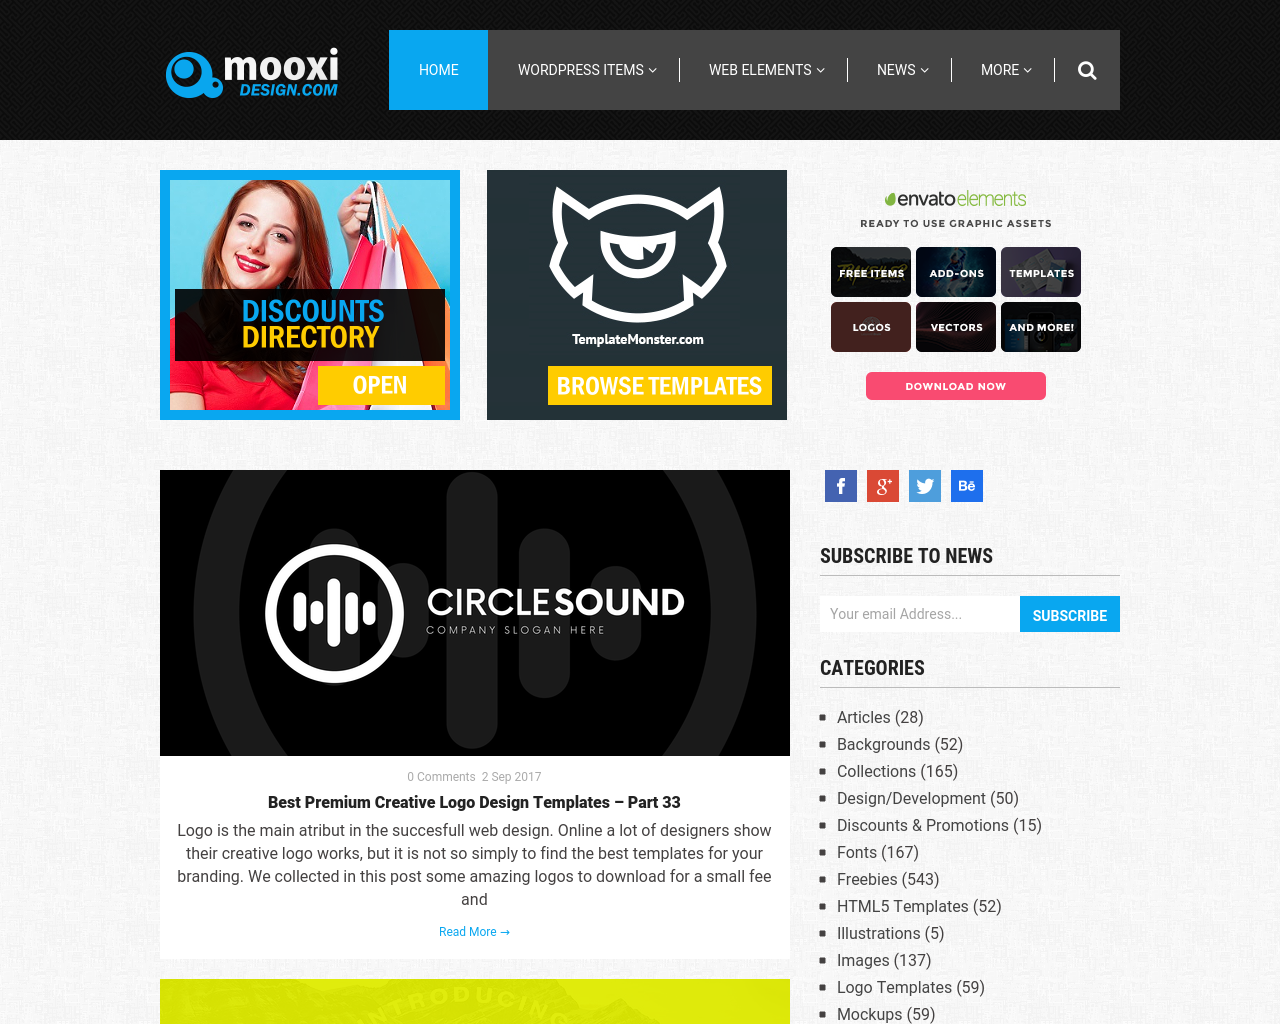 MooxiDesign-Advertising-Reviews-Pricing